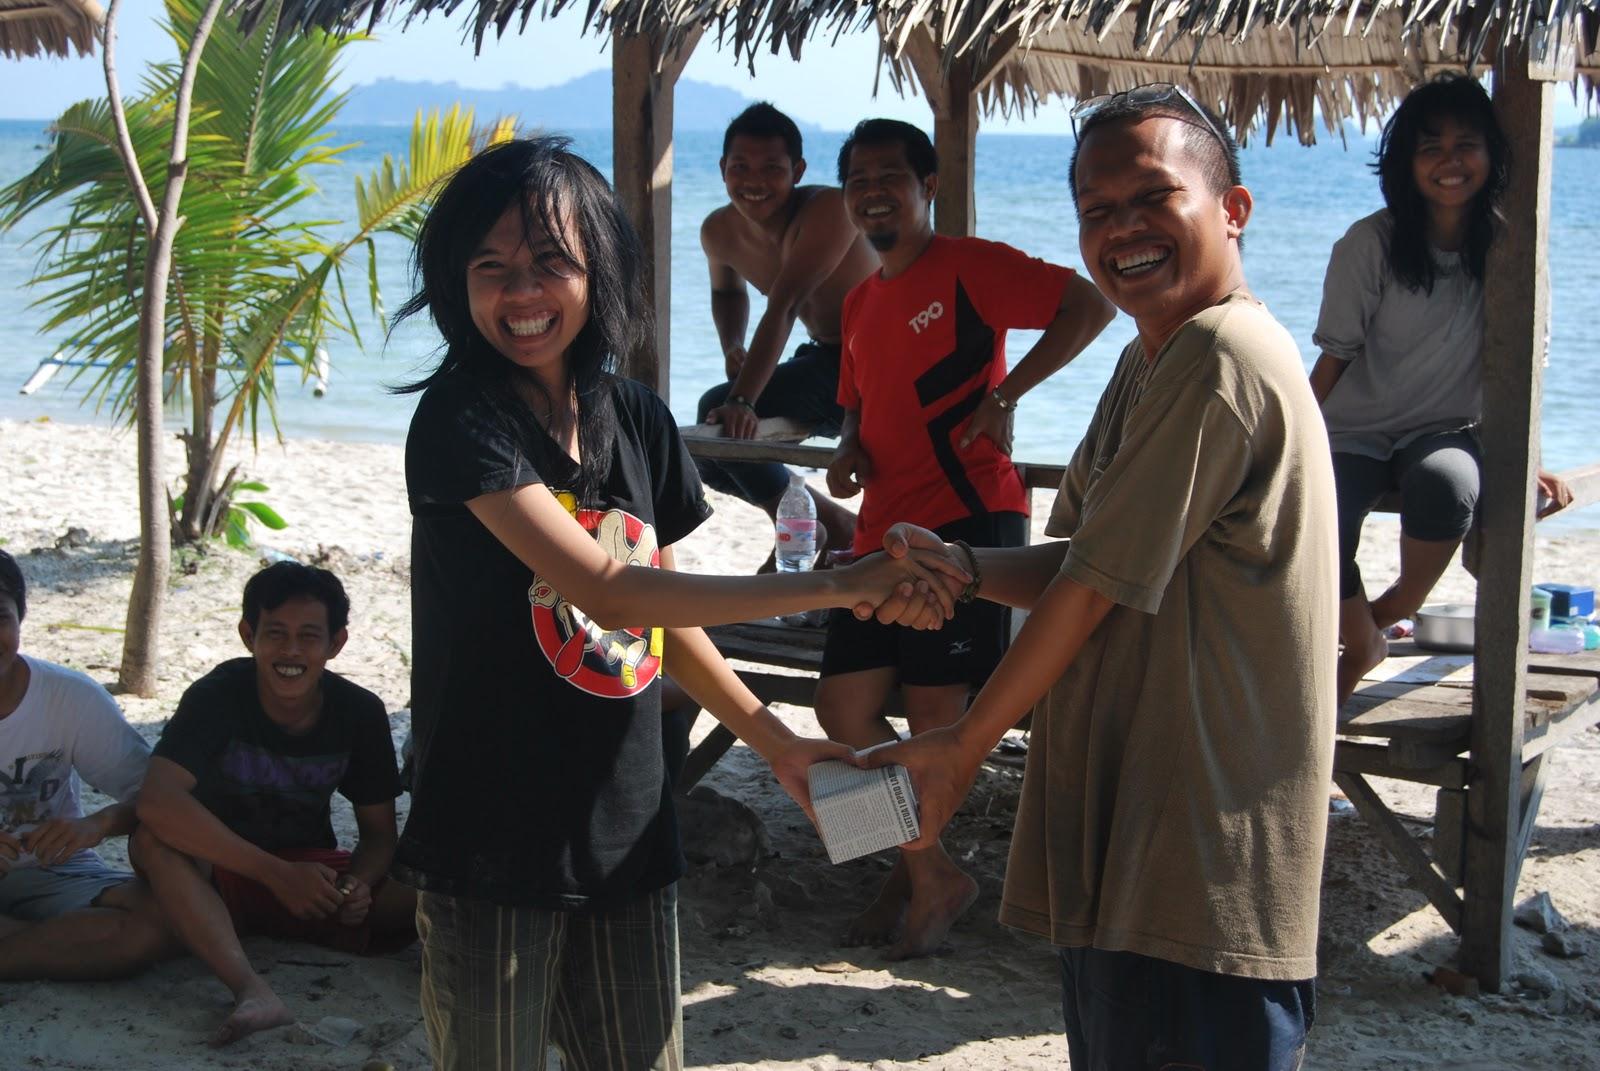 Jalan-Jalan Bersama Rekan Kerja ke Pantai Mutun